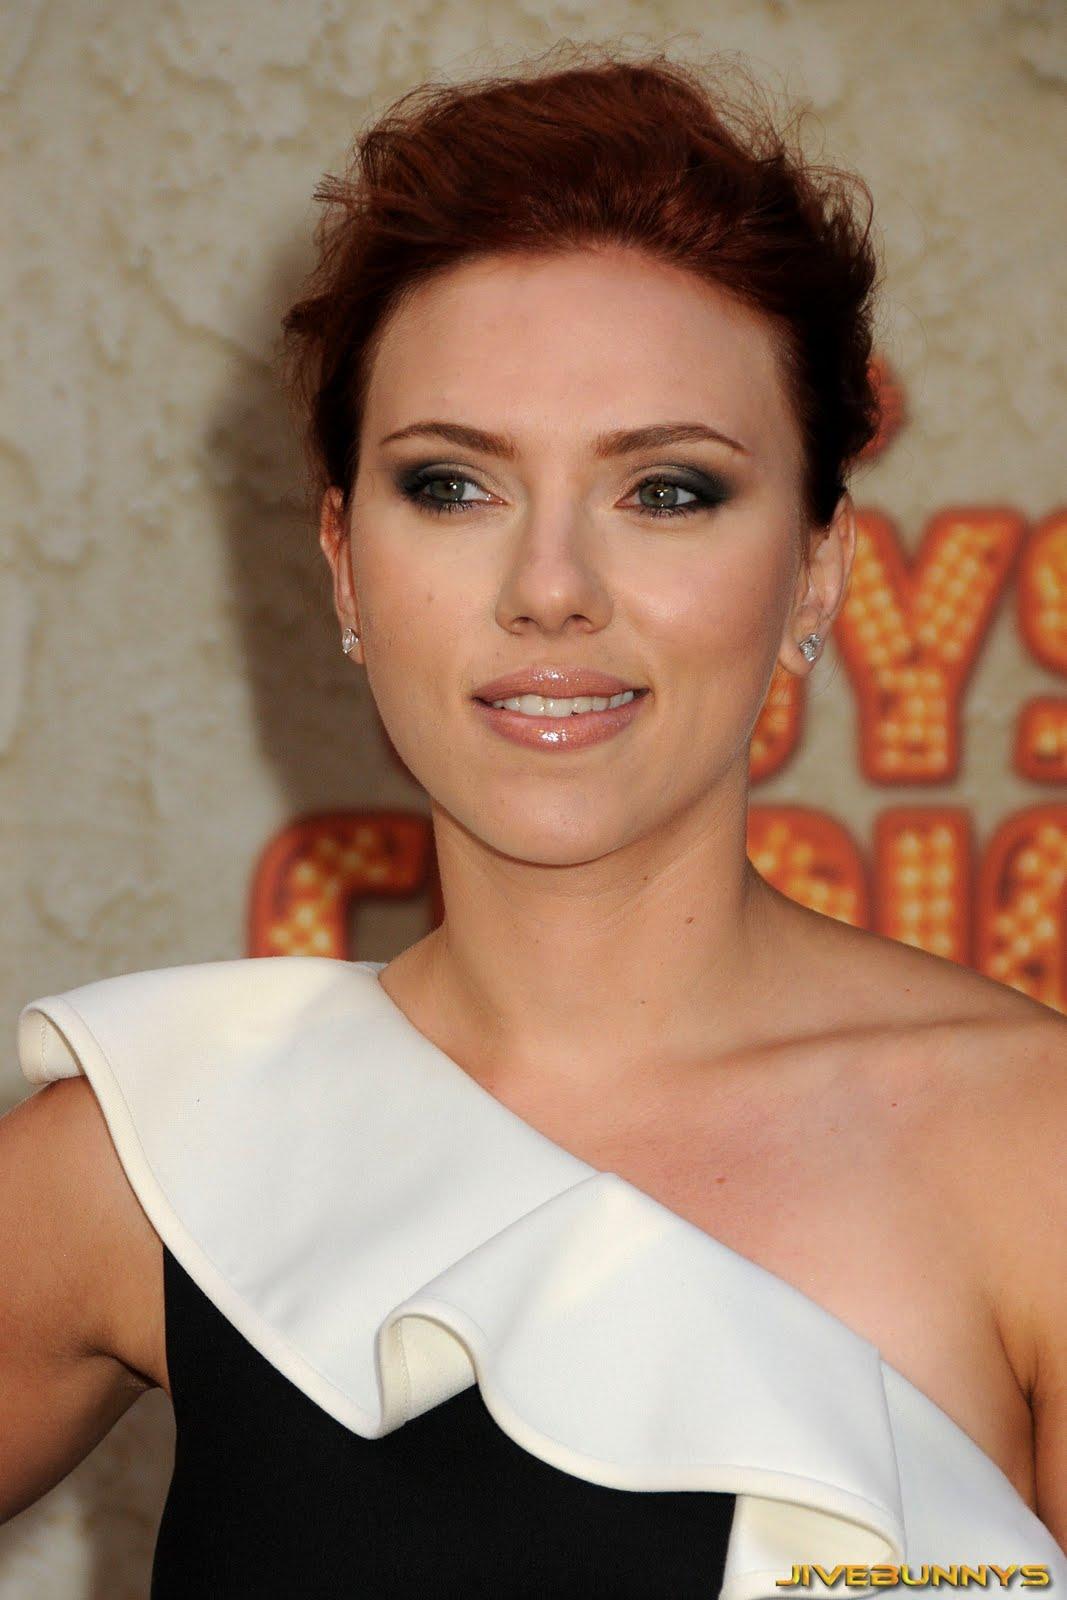 Scarlett johansson special pictures 22 film actresses - Scarlett johansson blogspot ...